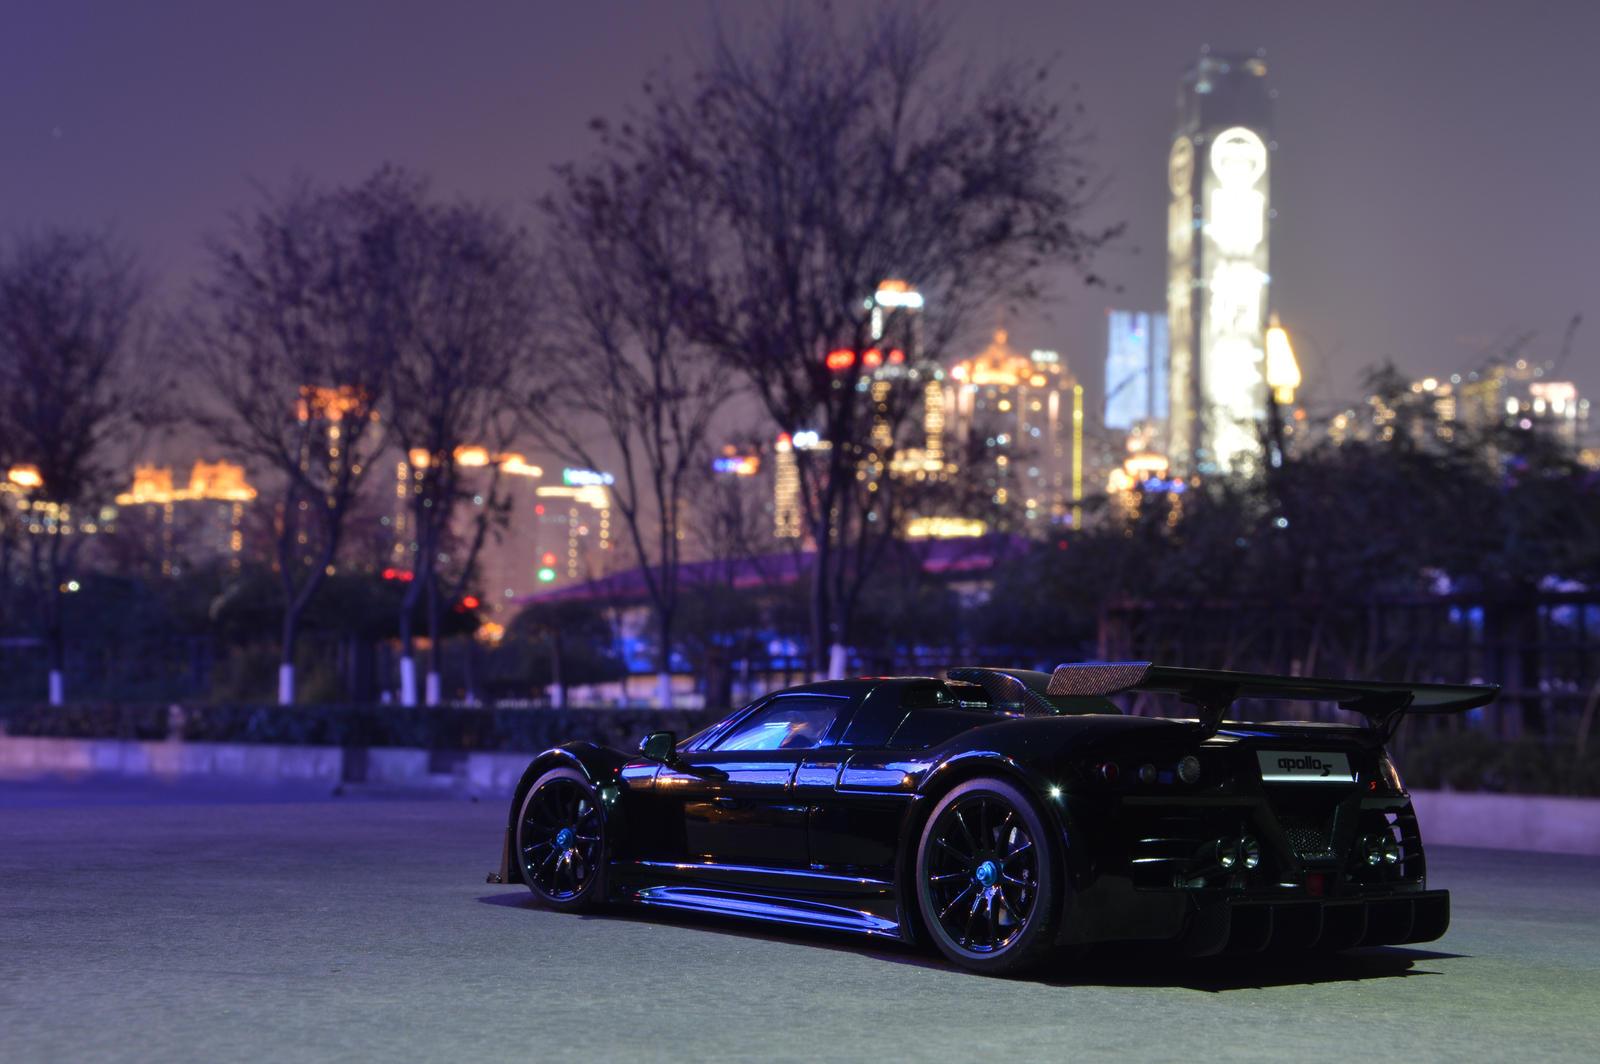 Dark Knight 3 by nismoz